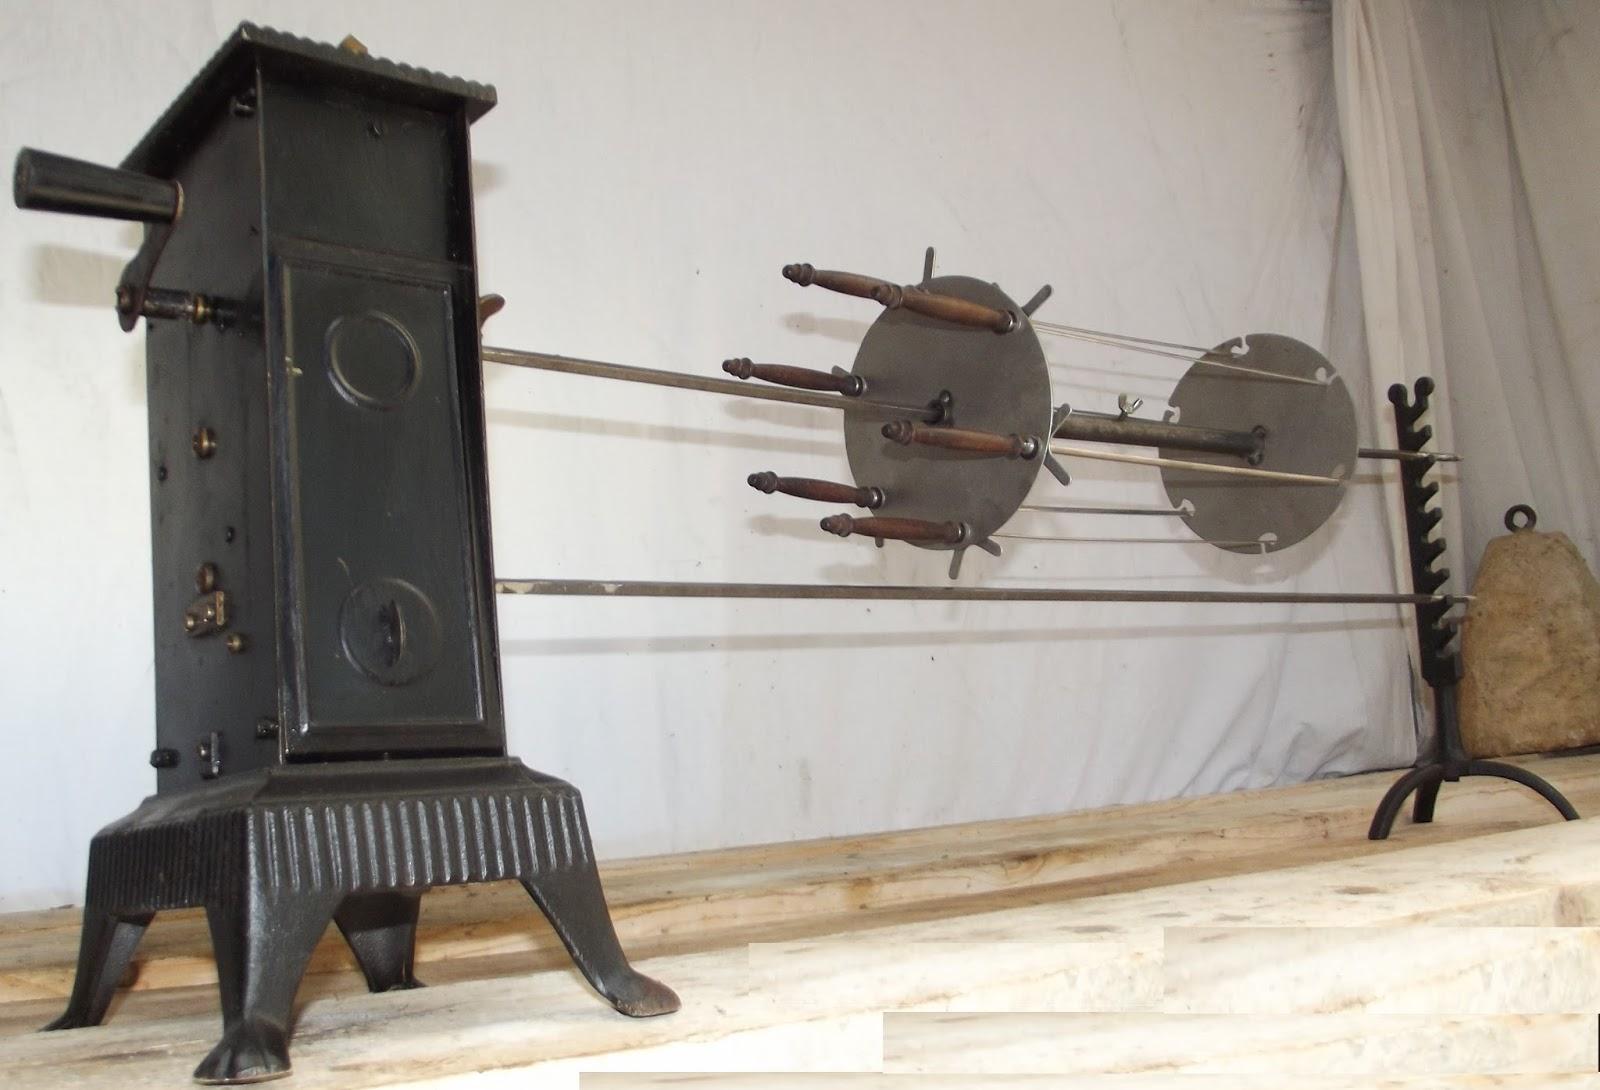 grand tourne broche m canisme d 39 horlogerie marque fuf barbecue brochettes grives ebay. Black Bedroom Furniture Sets. Home Design Ideas